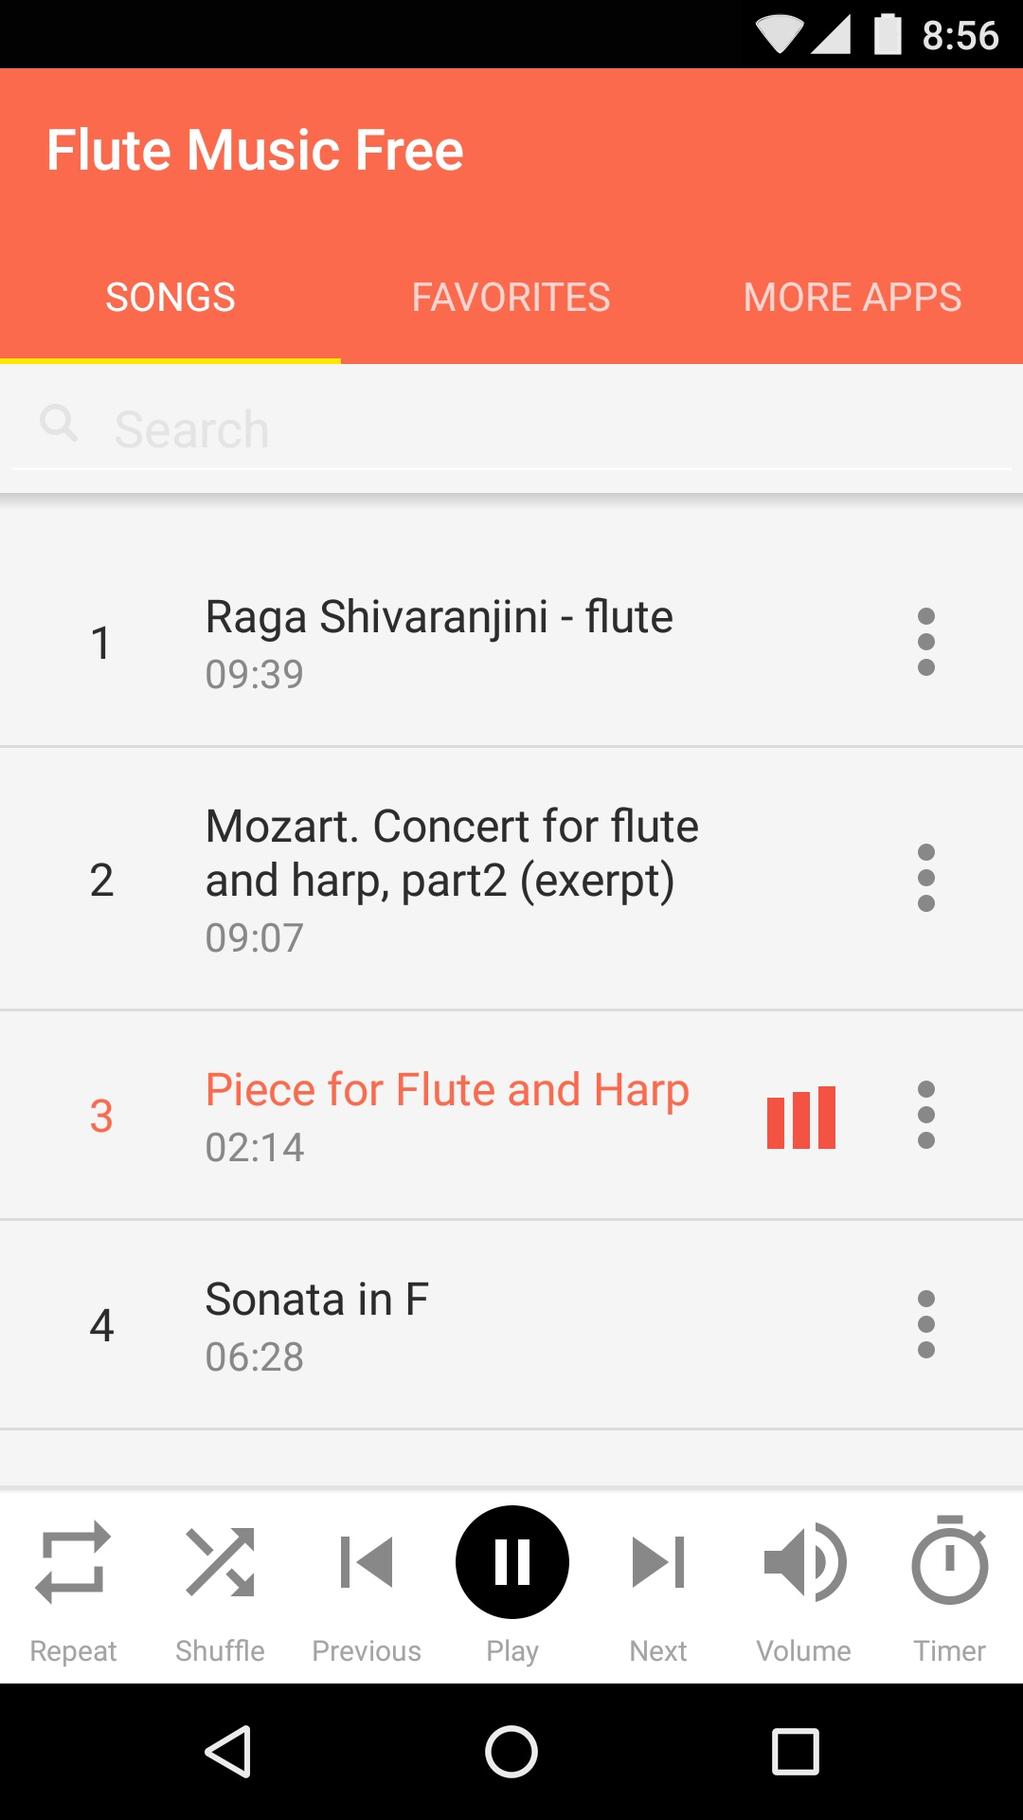 Flute Music Free Screenshot